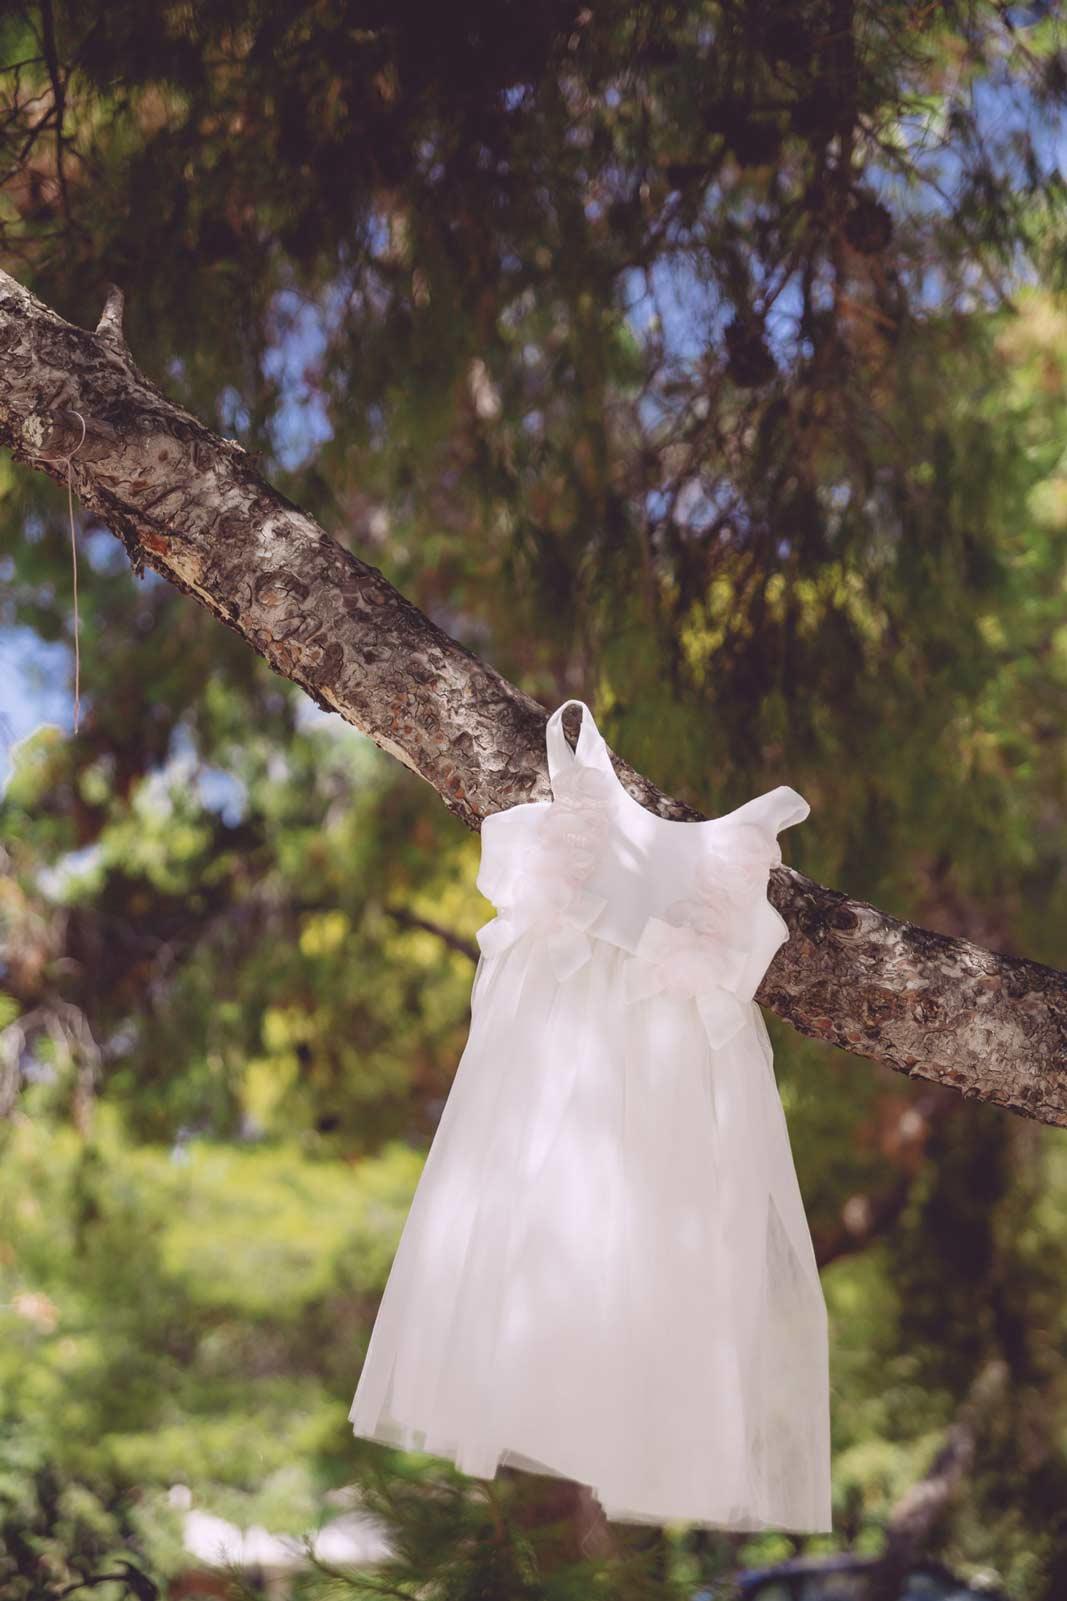 011 PhotoVaptisis βαπτιση βουλα αγιος νεκταριος vaptisi fotografos moro mama nona 016 PhotoVaptisis